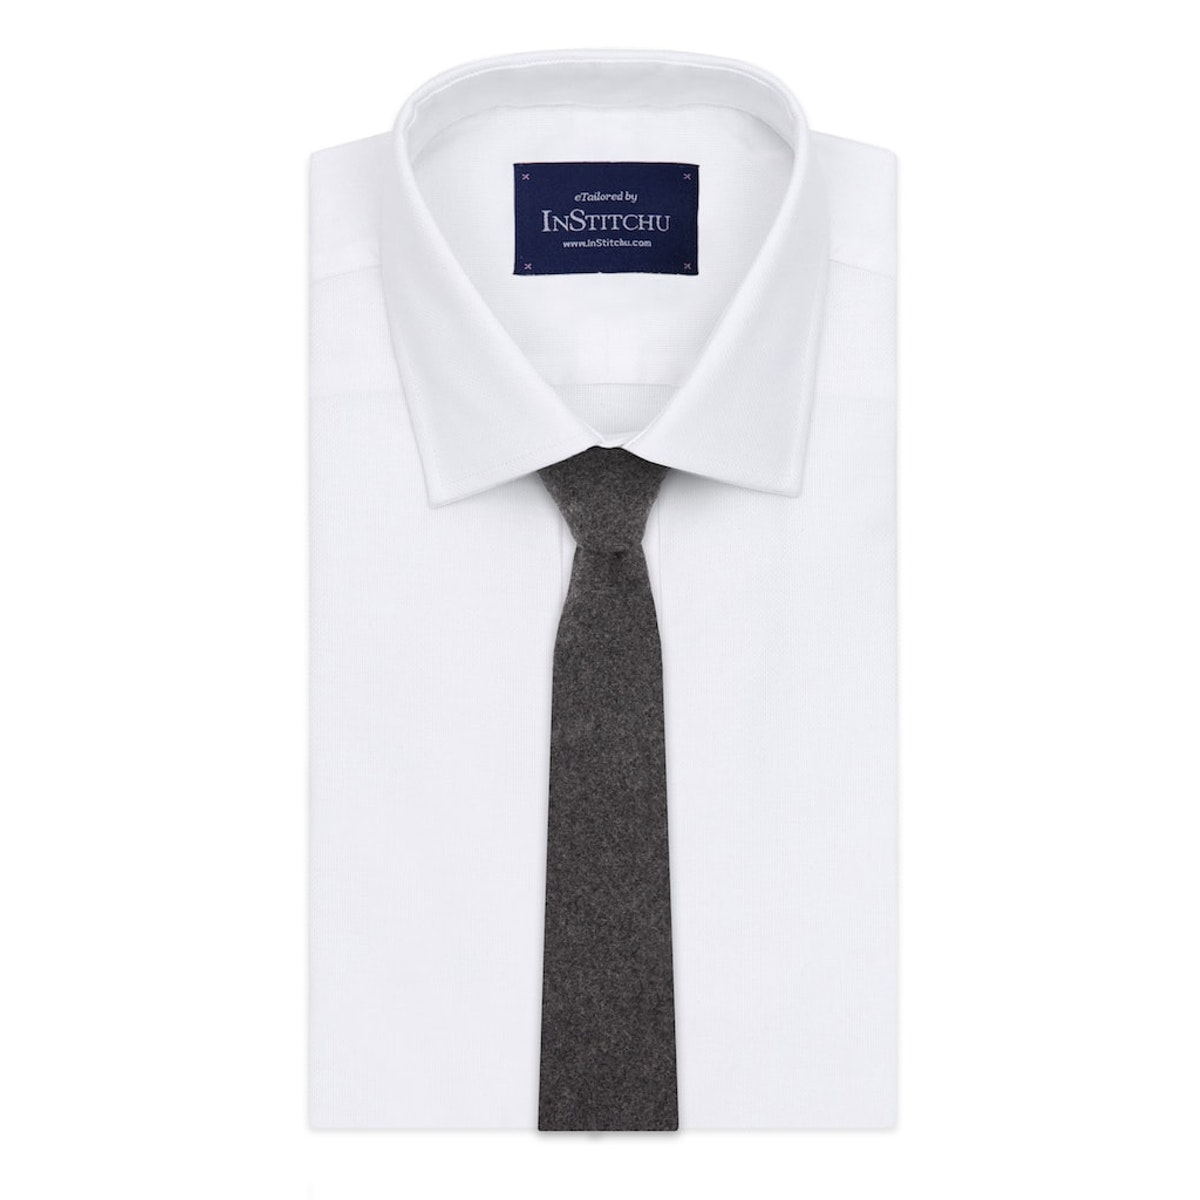 InStitchu Essentials Accessories Tie Shelly Deep Charcoal Wool Blend Tie